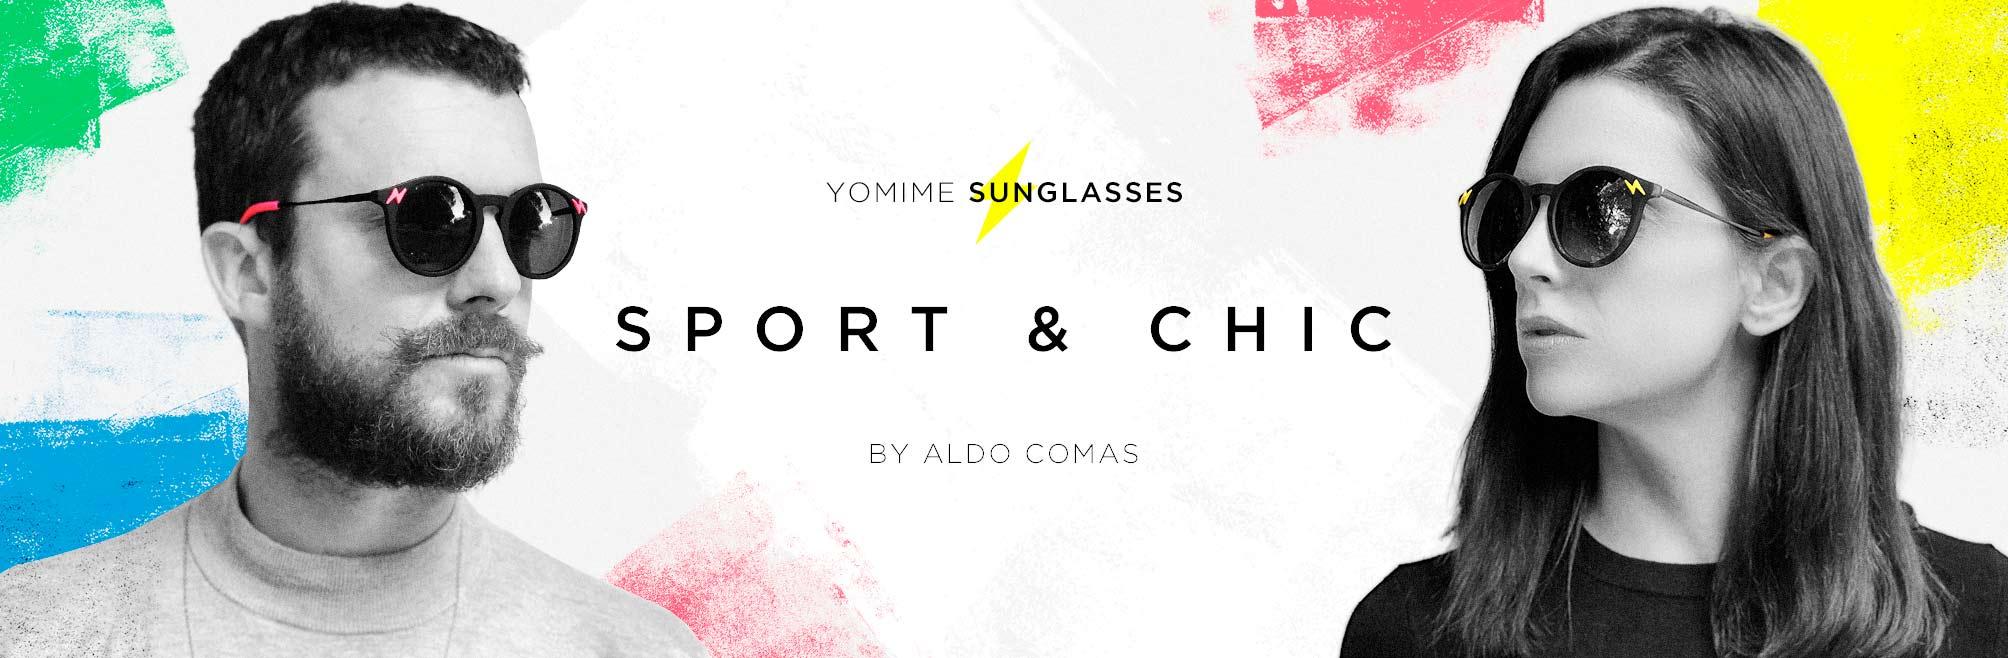 Sunglasses. Sport & Chic